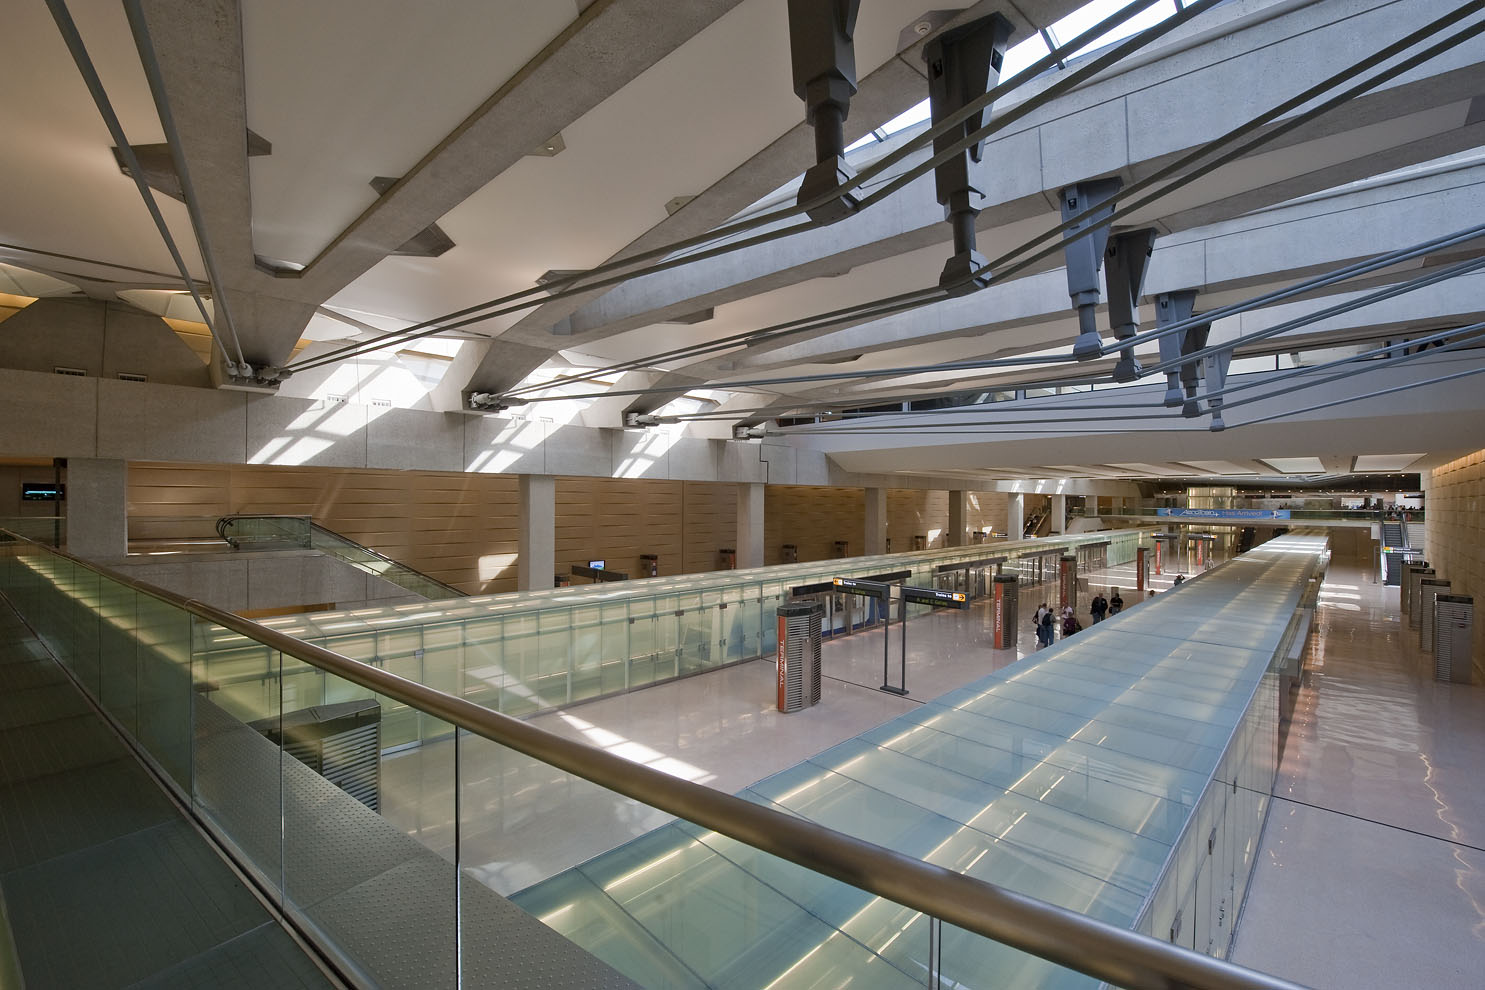 Architects: SOMGC: Turner Construction Company